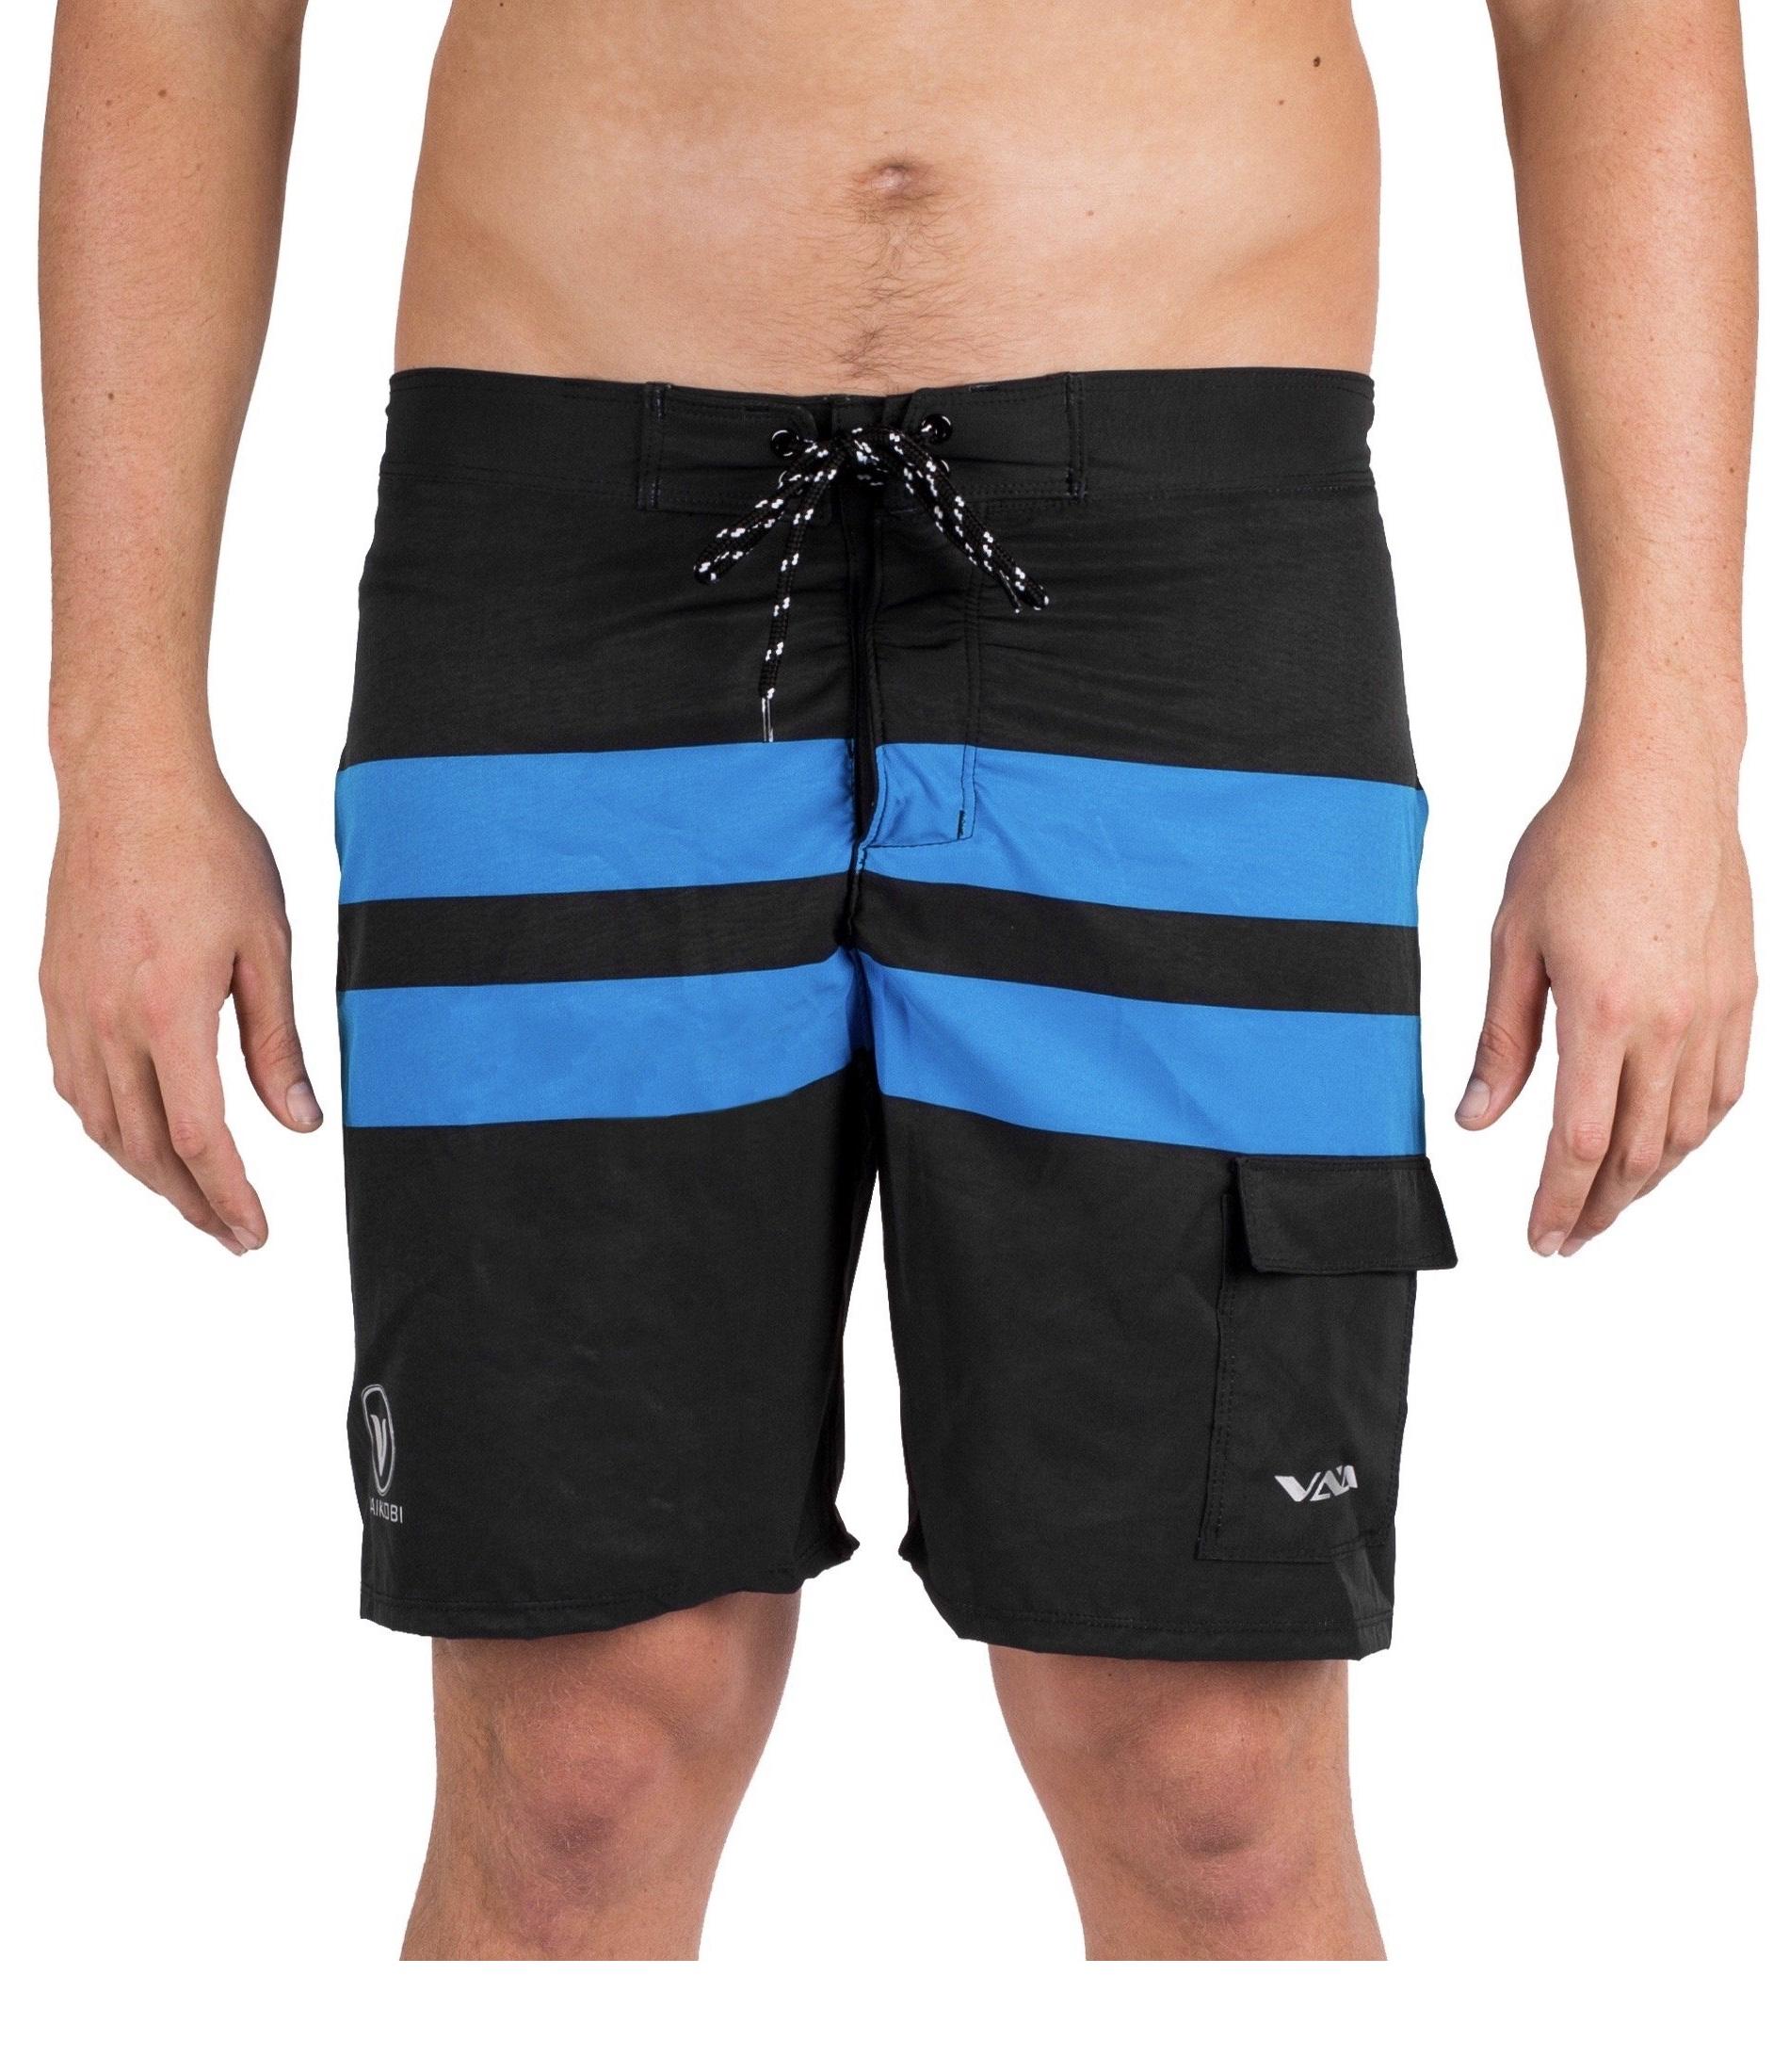 Vaikobi Board Shorts